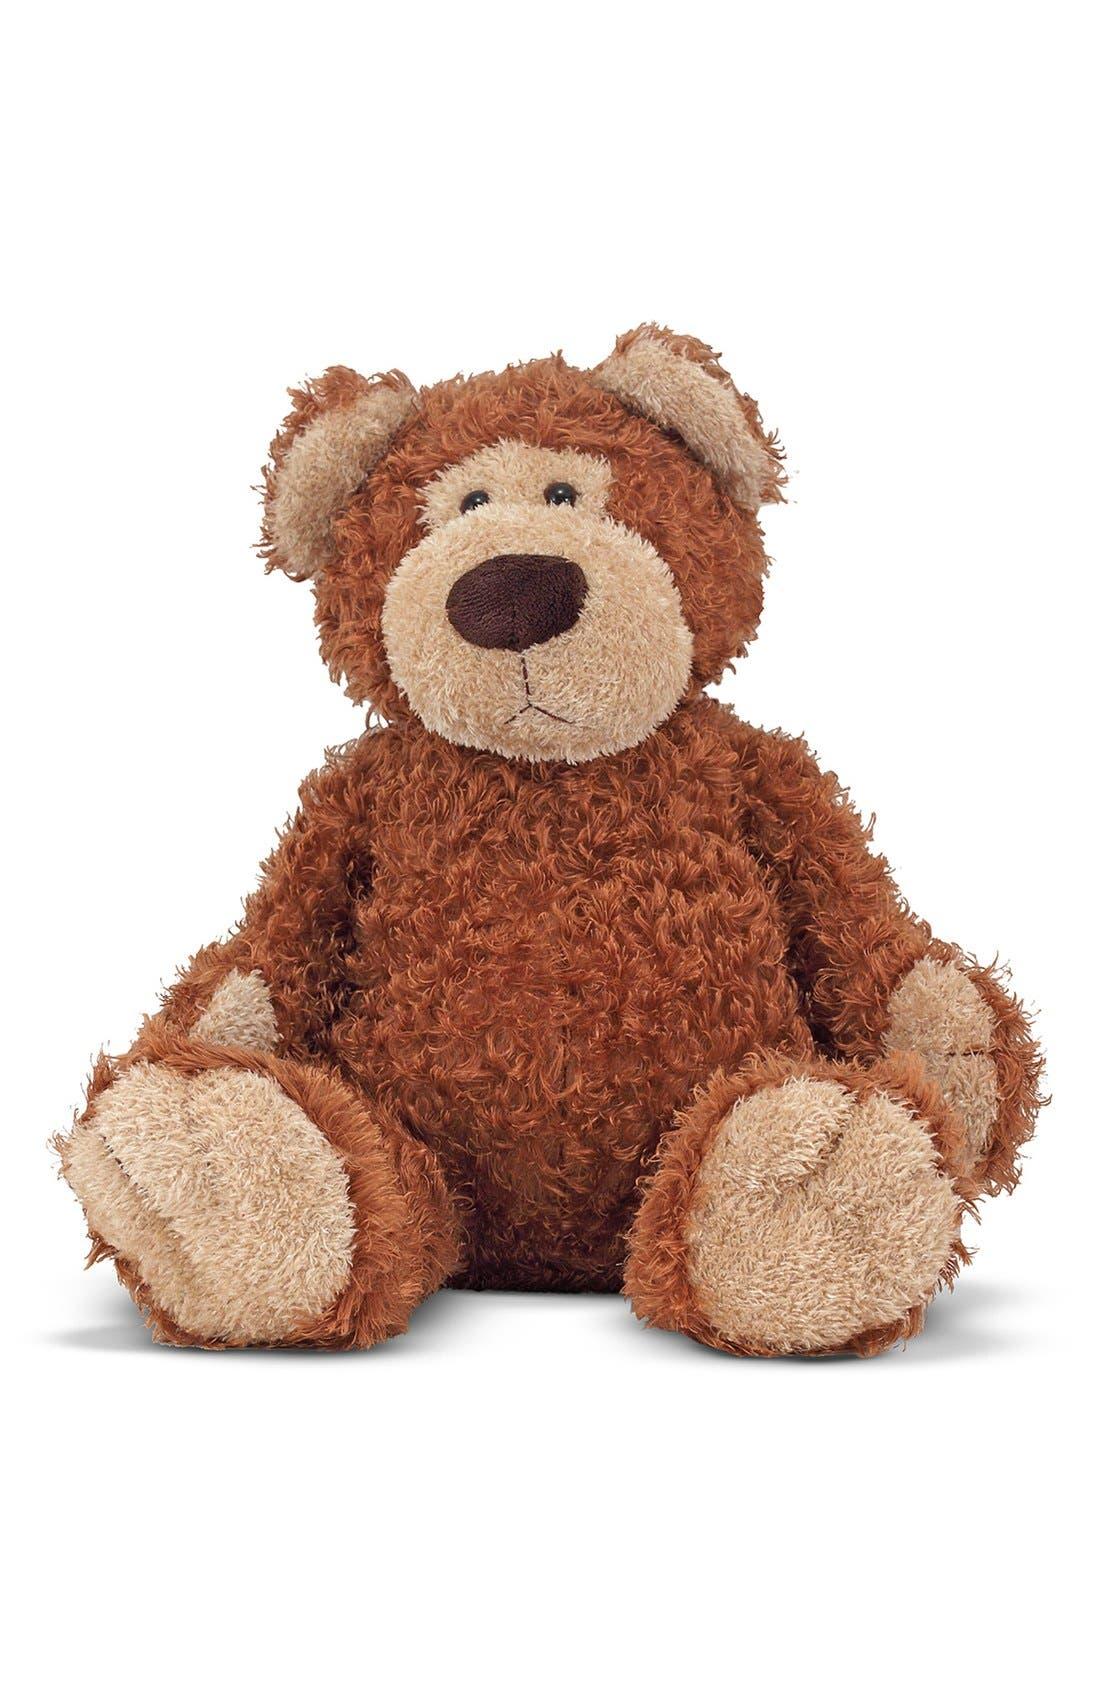 Alternate Image 1 Selected - Melissa & Doug 'Big Roscoe' Stuffed Bear